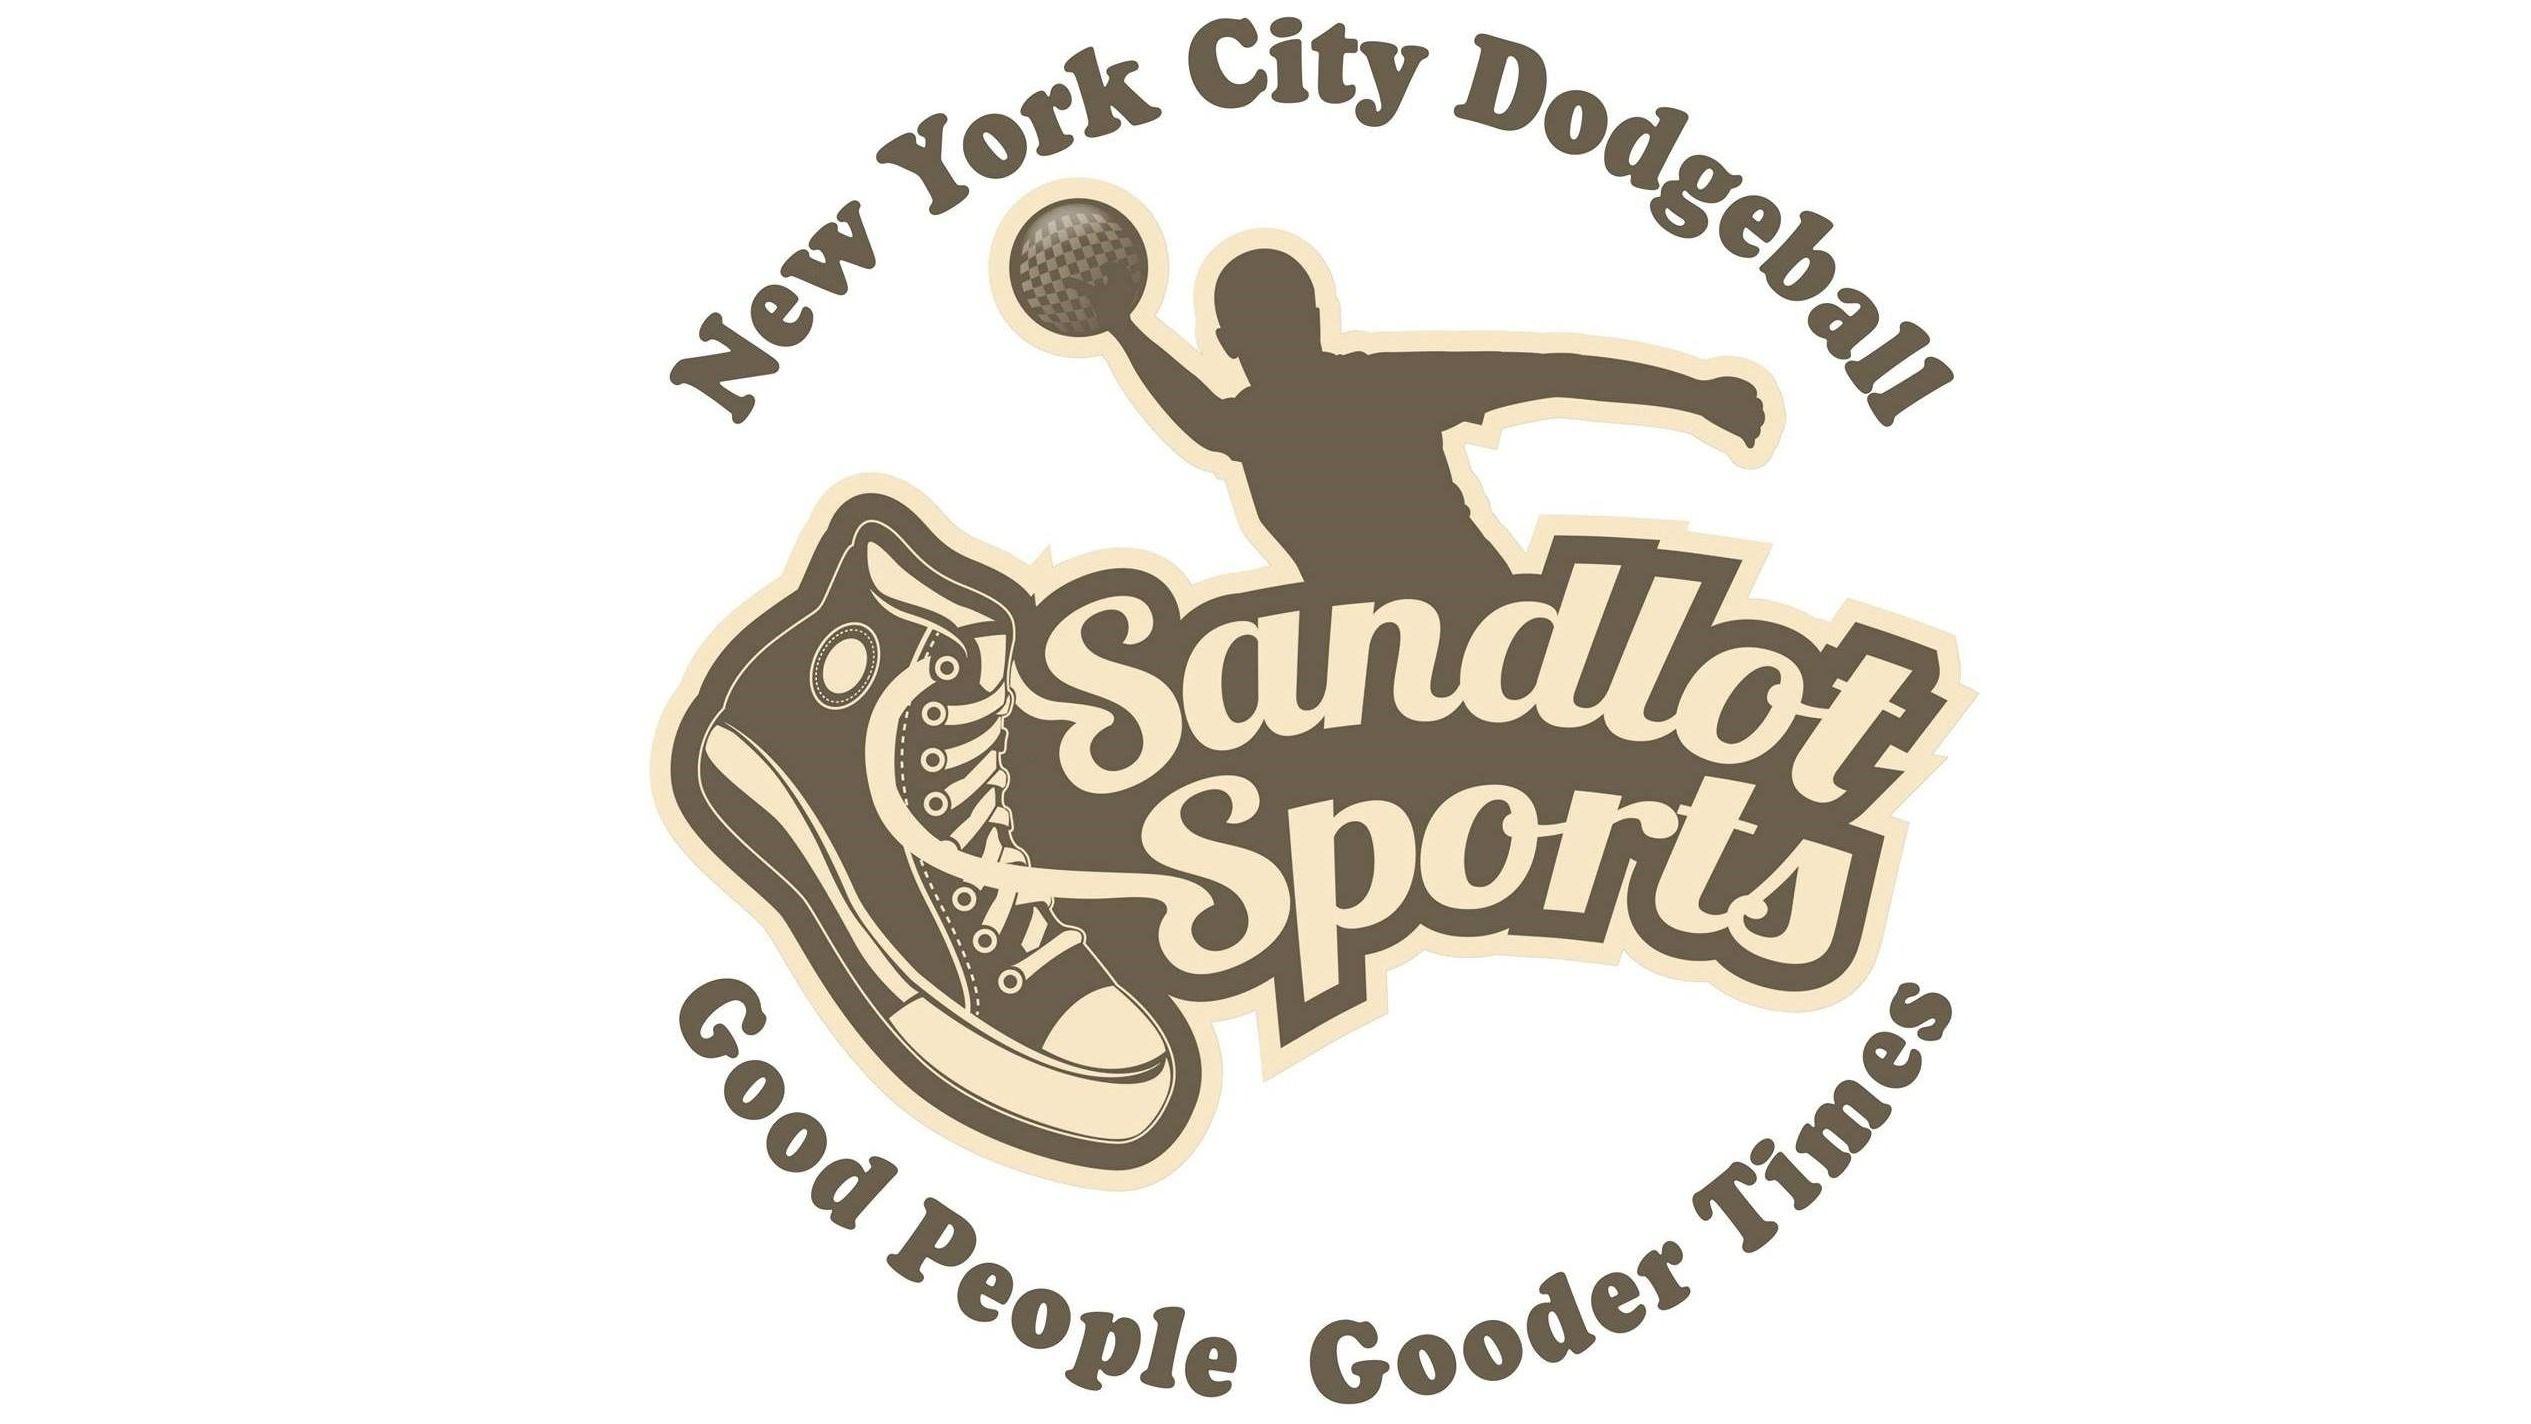 NYC Dodgeball funsies!